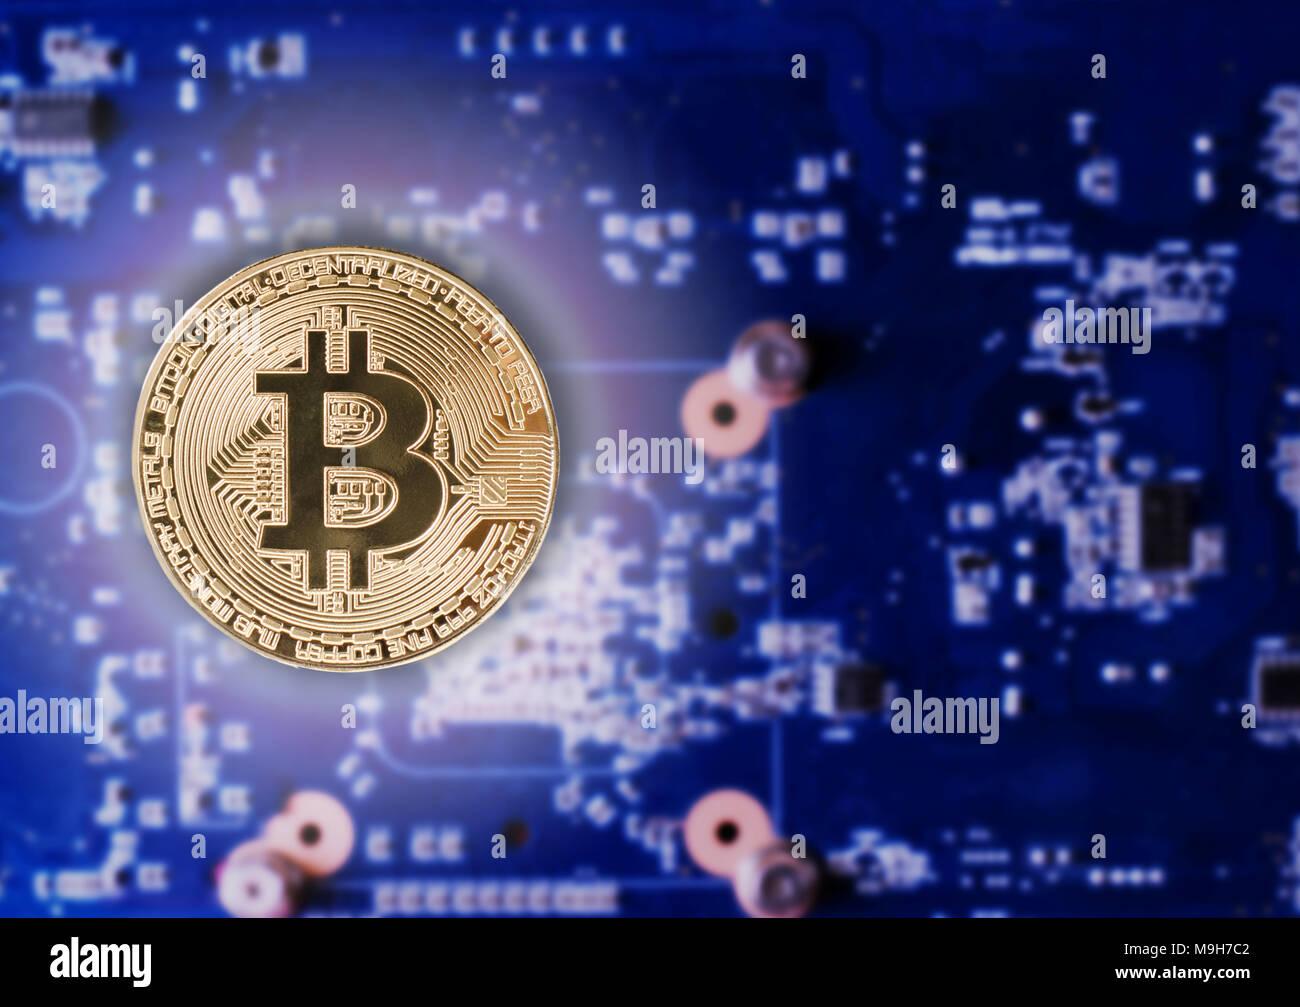 Computer Graphics Card Stock Photo Image Of Block Macro Auto Printed Circuit Board Images 7251734 Chain Photos U0026